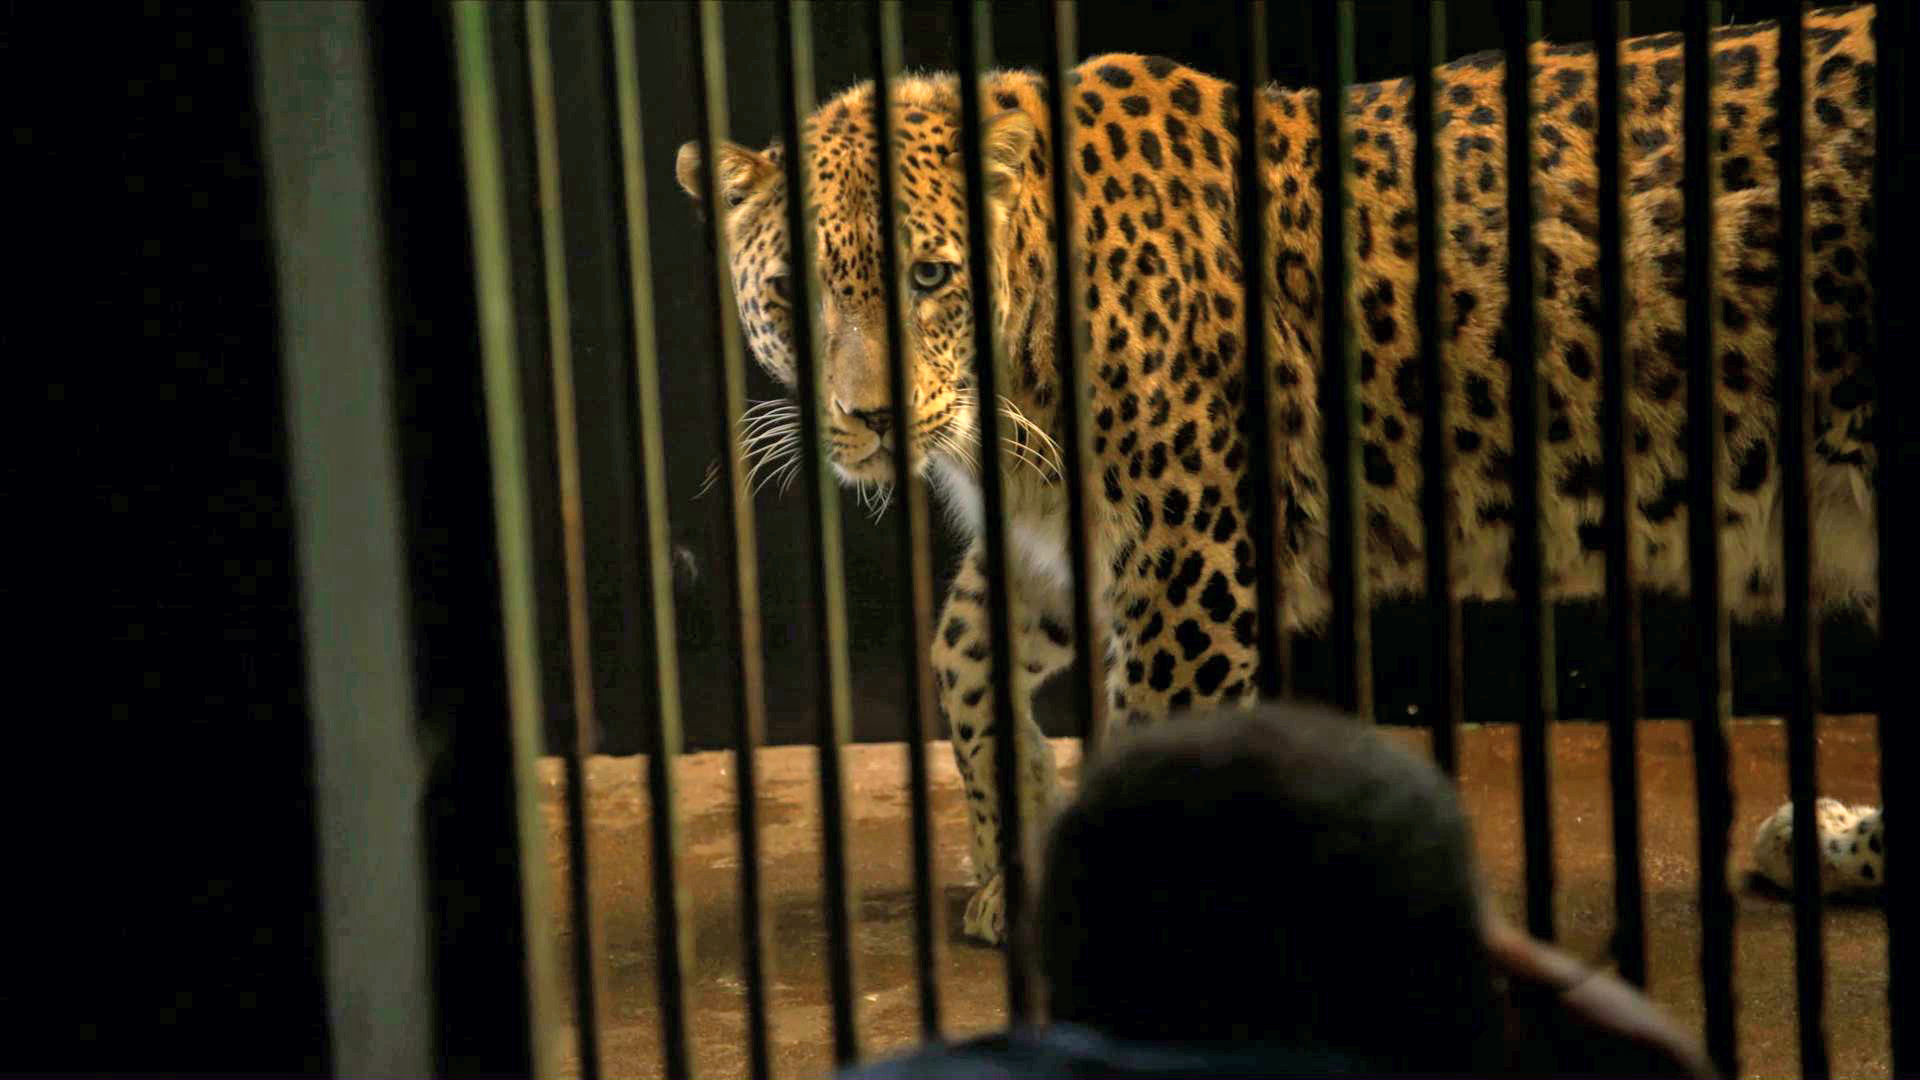 Creature Clip: Persian Leopard - 1:52 - This rare Persian leopard was the 5,000th animal to board Joel Sartore's Photo Ark.